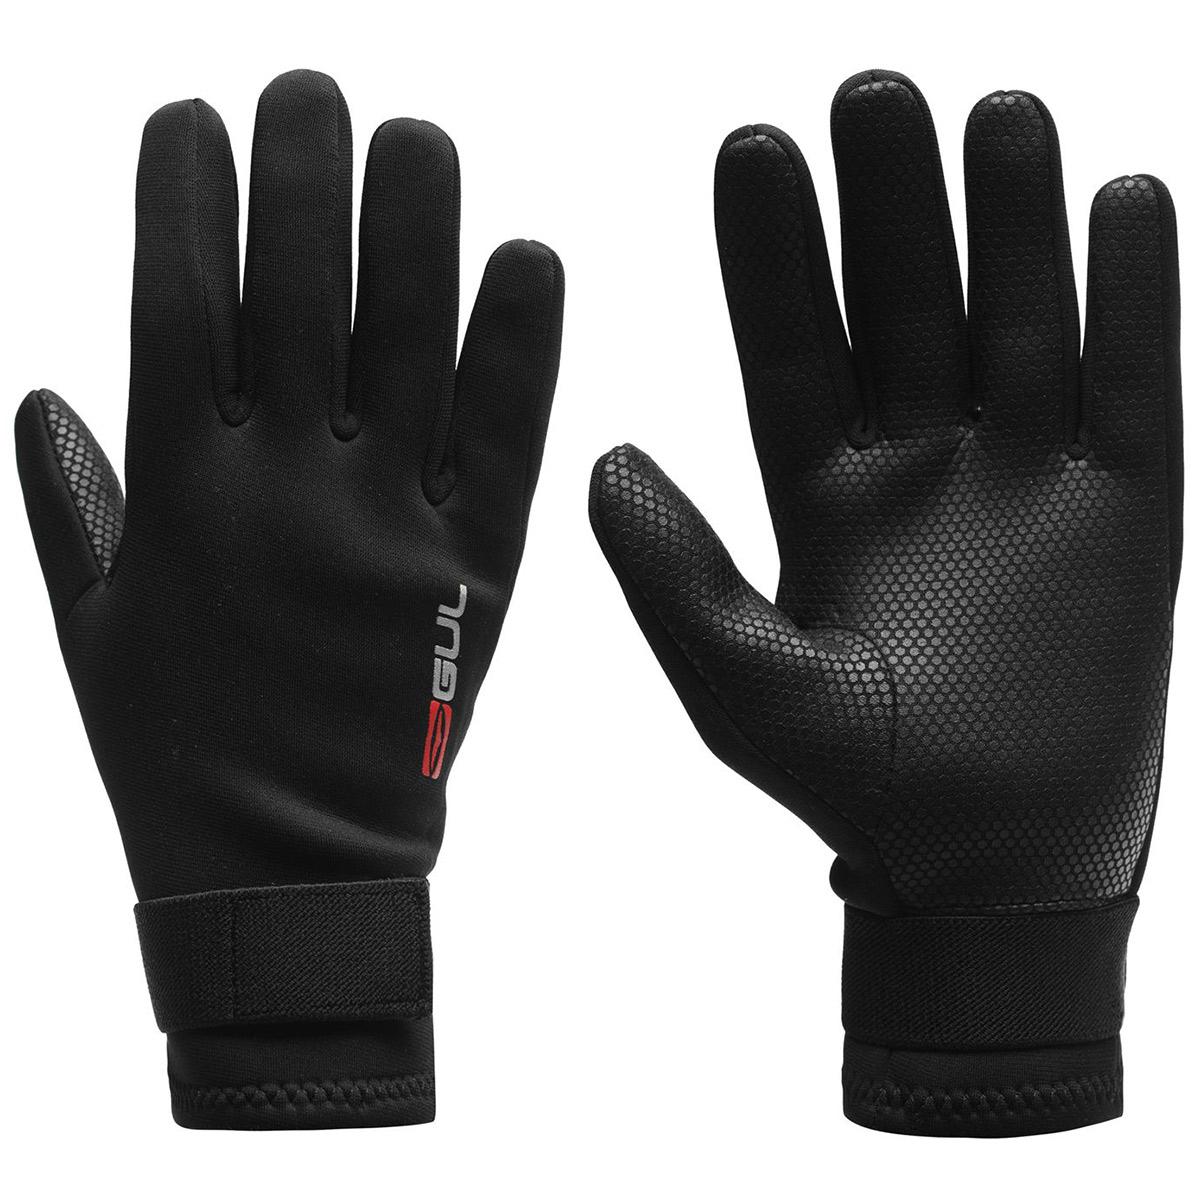 GUL Unisex Water Sports Gloves - Black, S